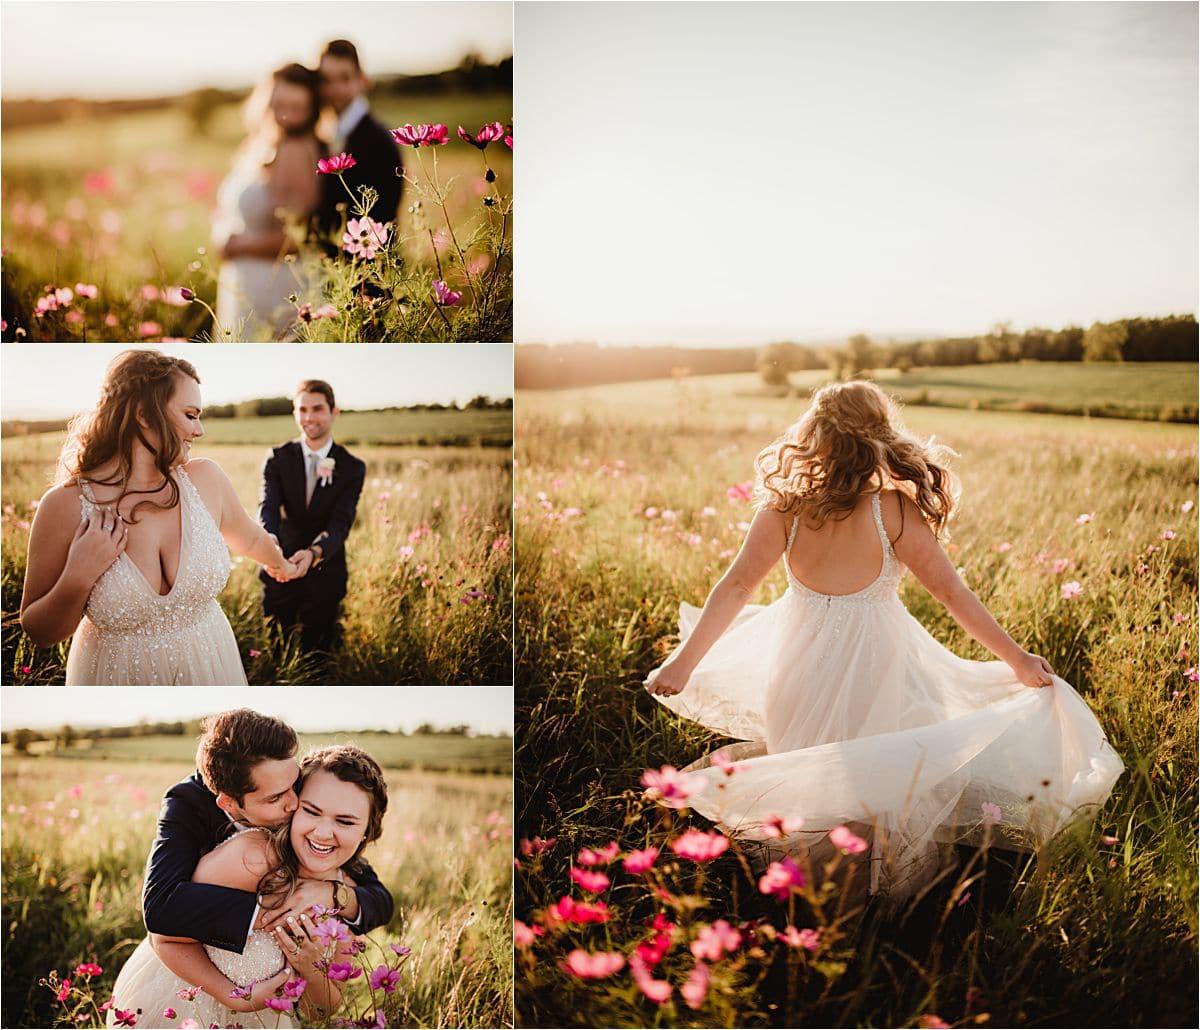 Rural Summer Barn Wedding Couple in Flower Field Sunset